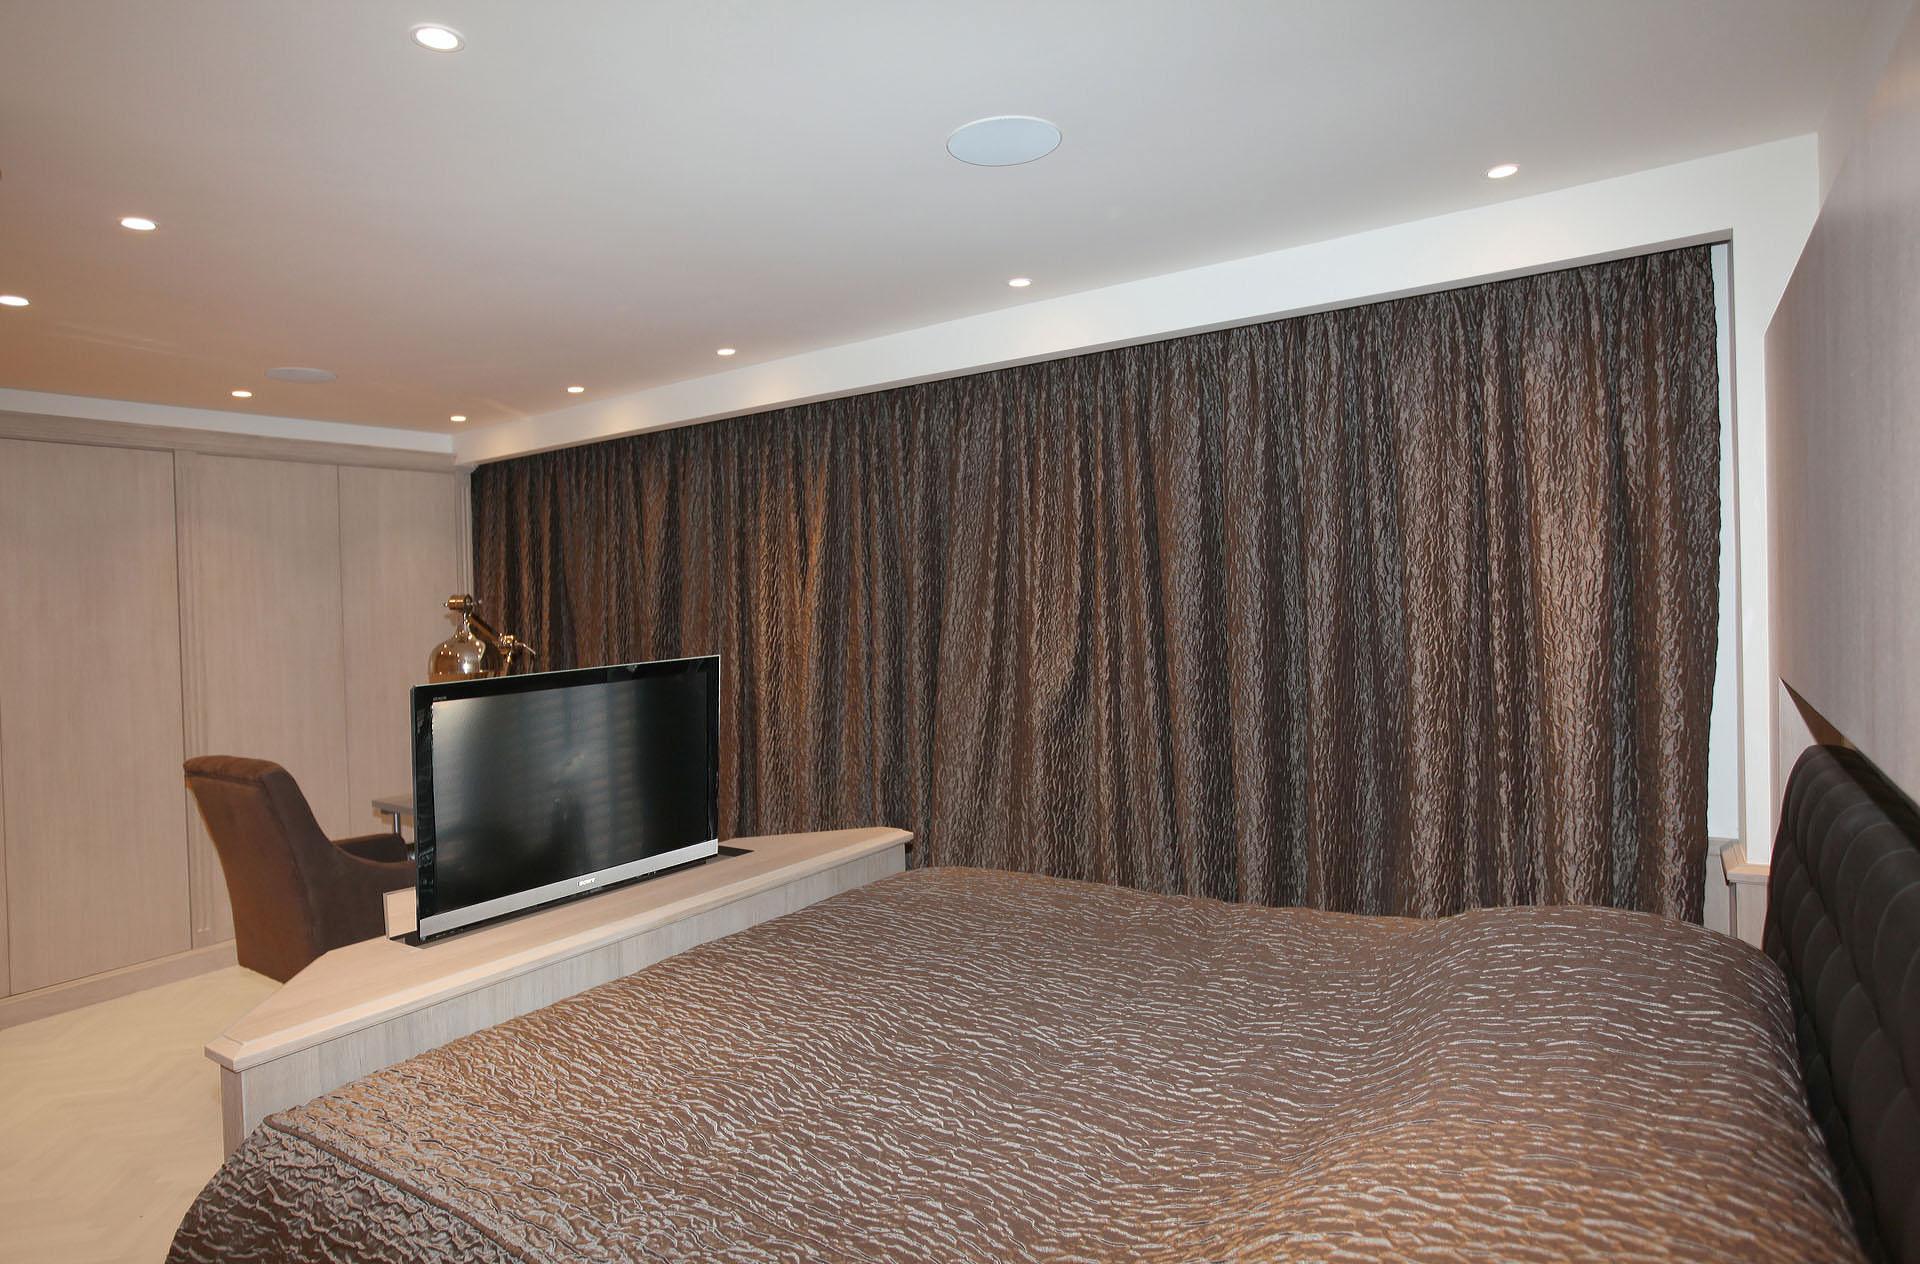 https://www.marcottestyle.com/wordpress/wp-content/uploads/2018/02/Marcottestyle-penthouse-strak-landelijke-stijl-80.jpg